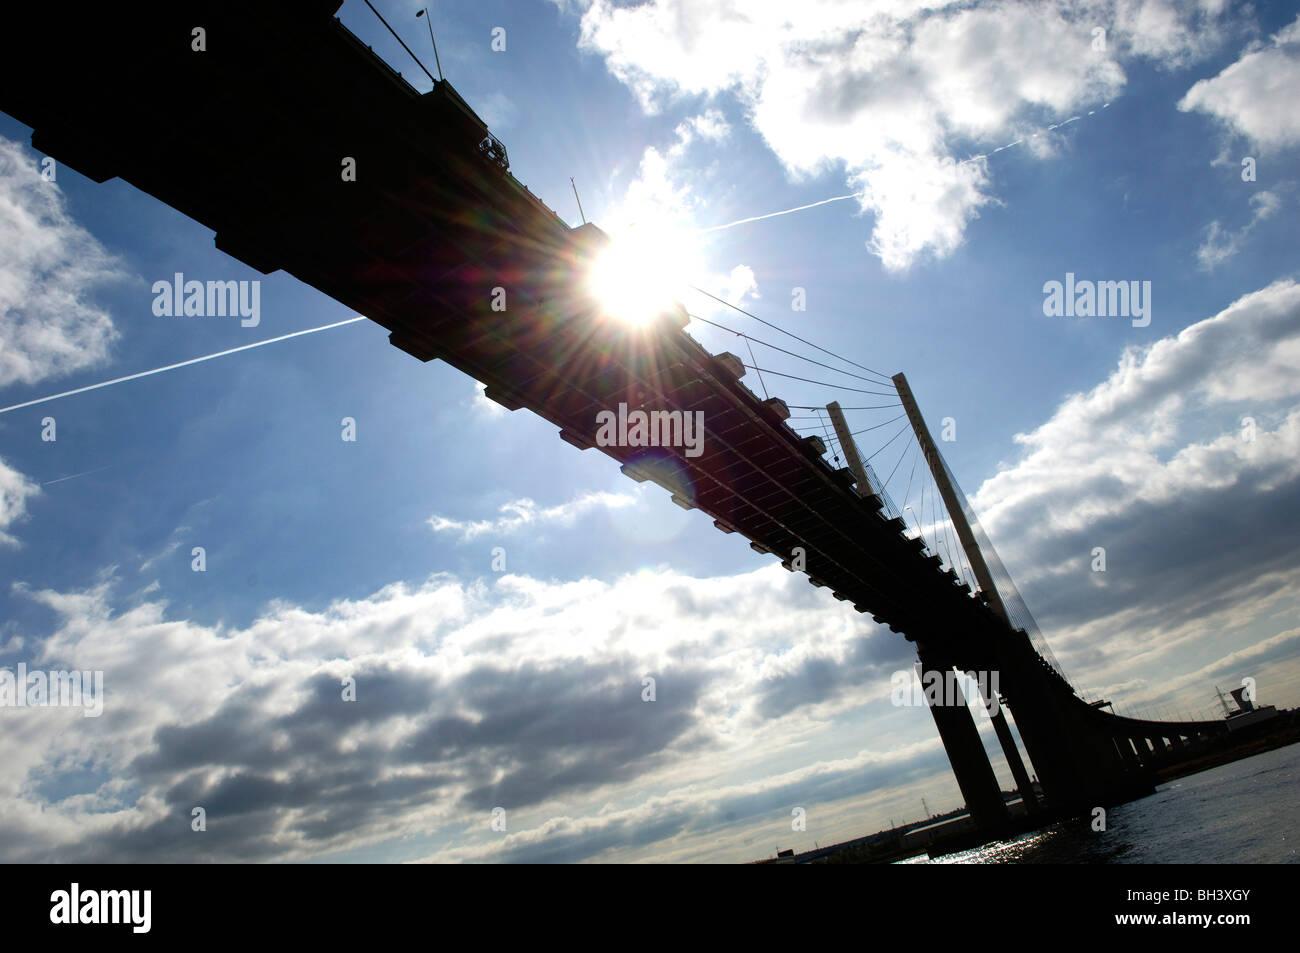 The sun bursts through under the Dartford Bridge, Kent, 1st October 2009. - Stock Image